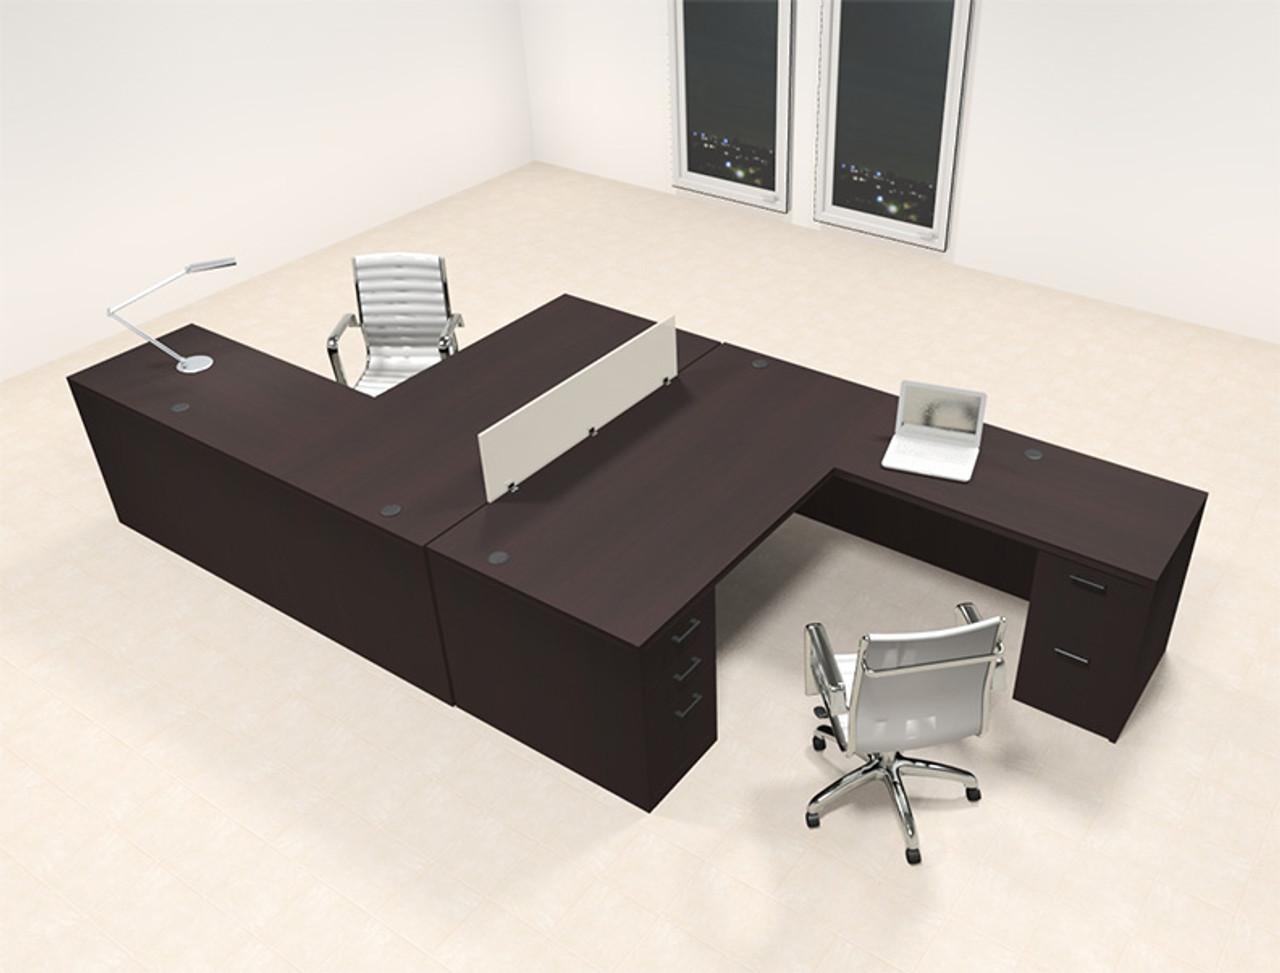 Two Persons L Shaped Office Divider Workstation Desk Set Ch Amb Fp2 Color4office